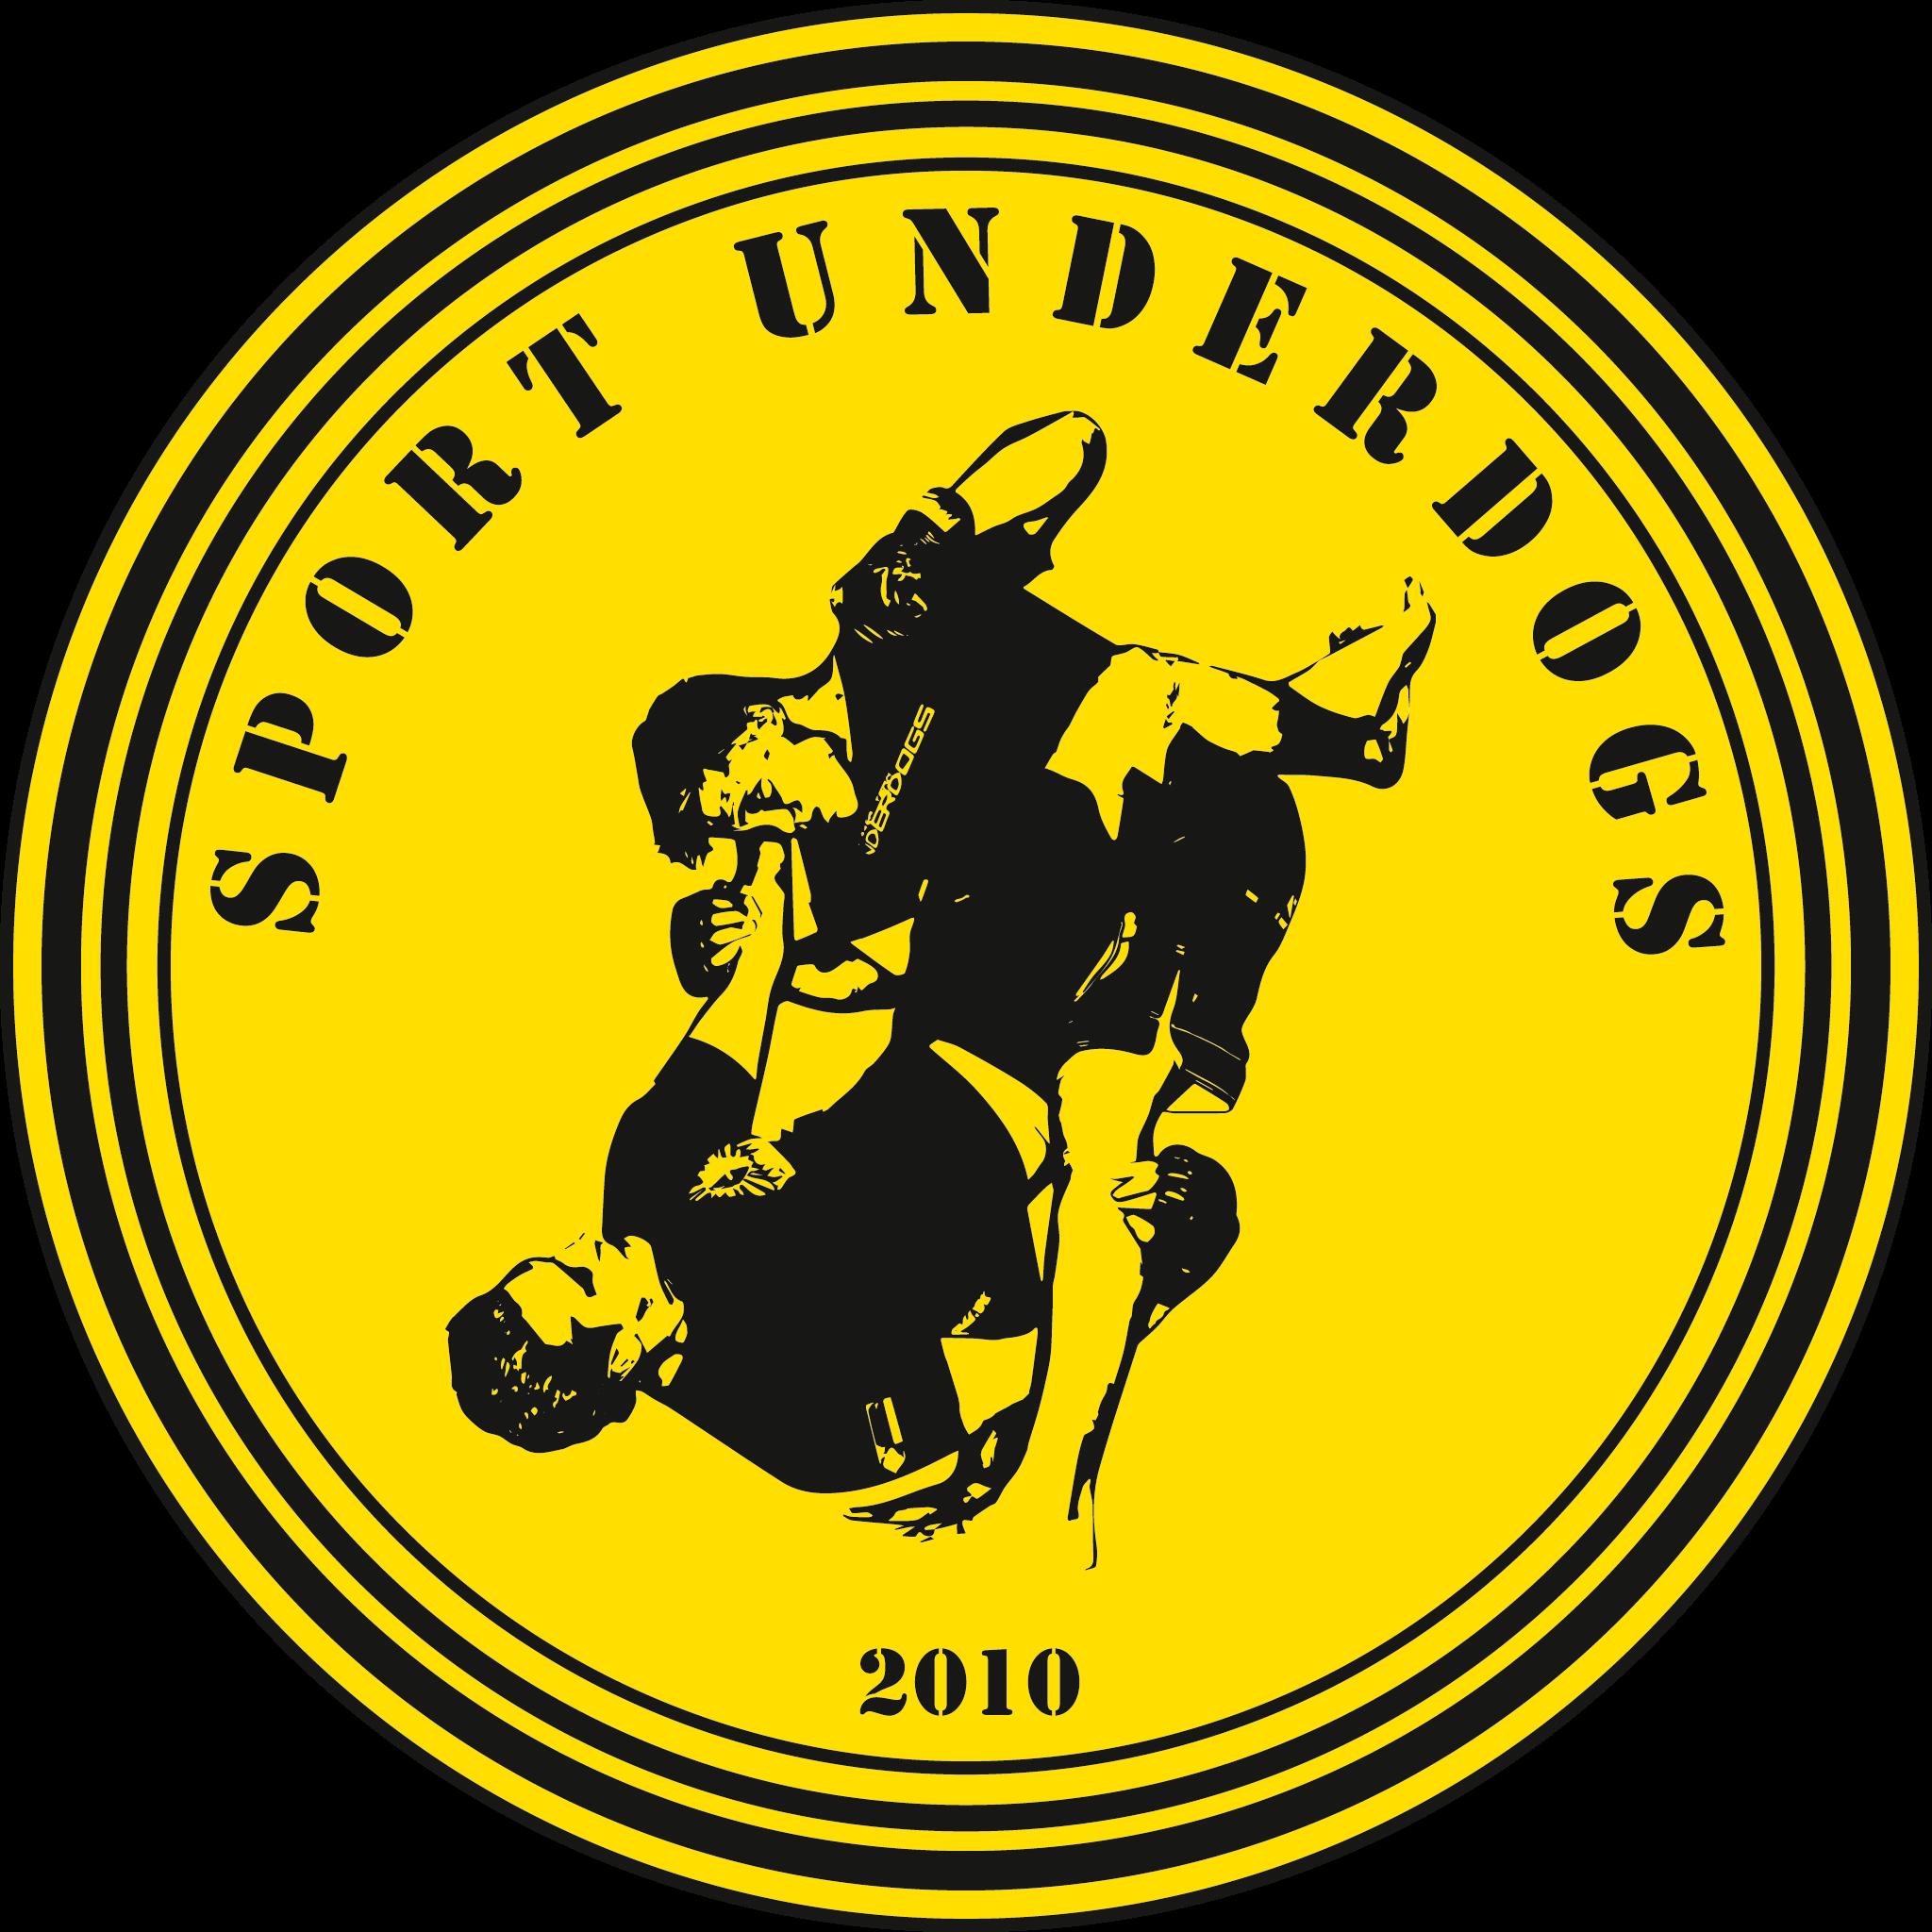 Sportschule Sport Underdogs